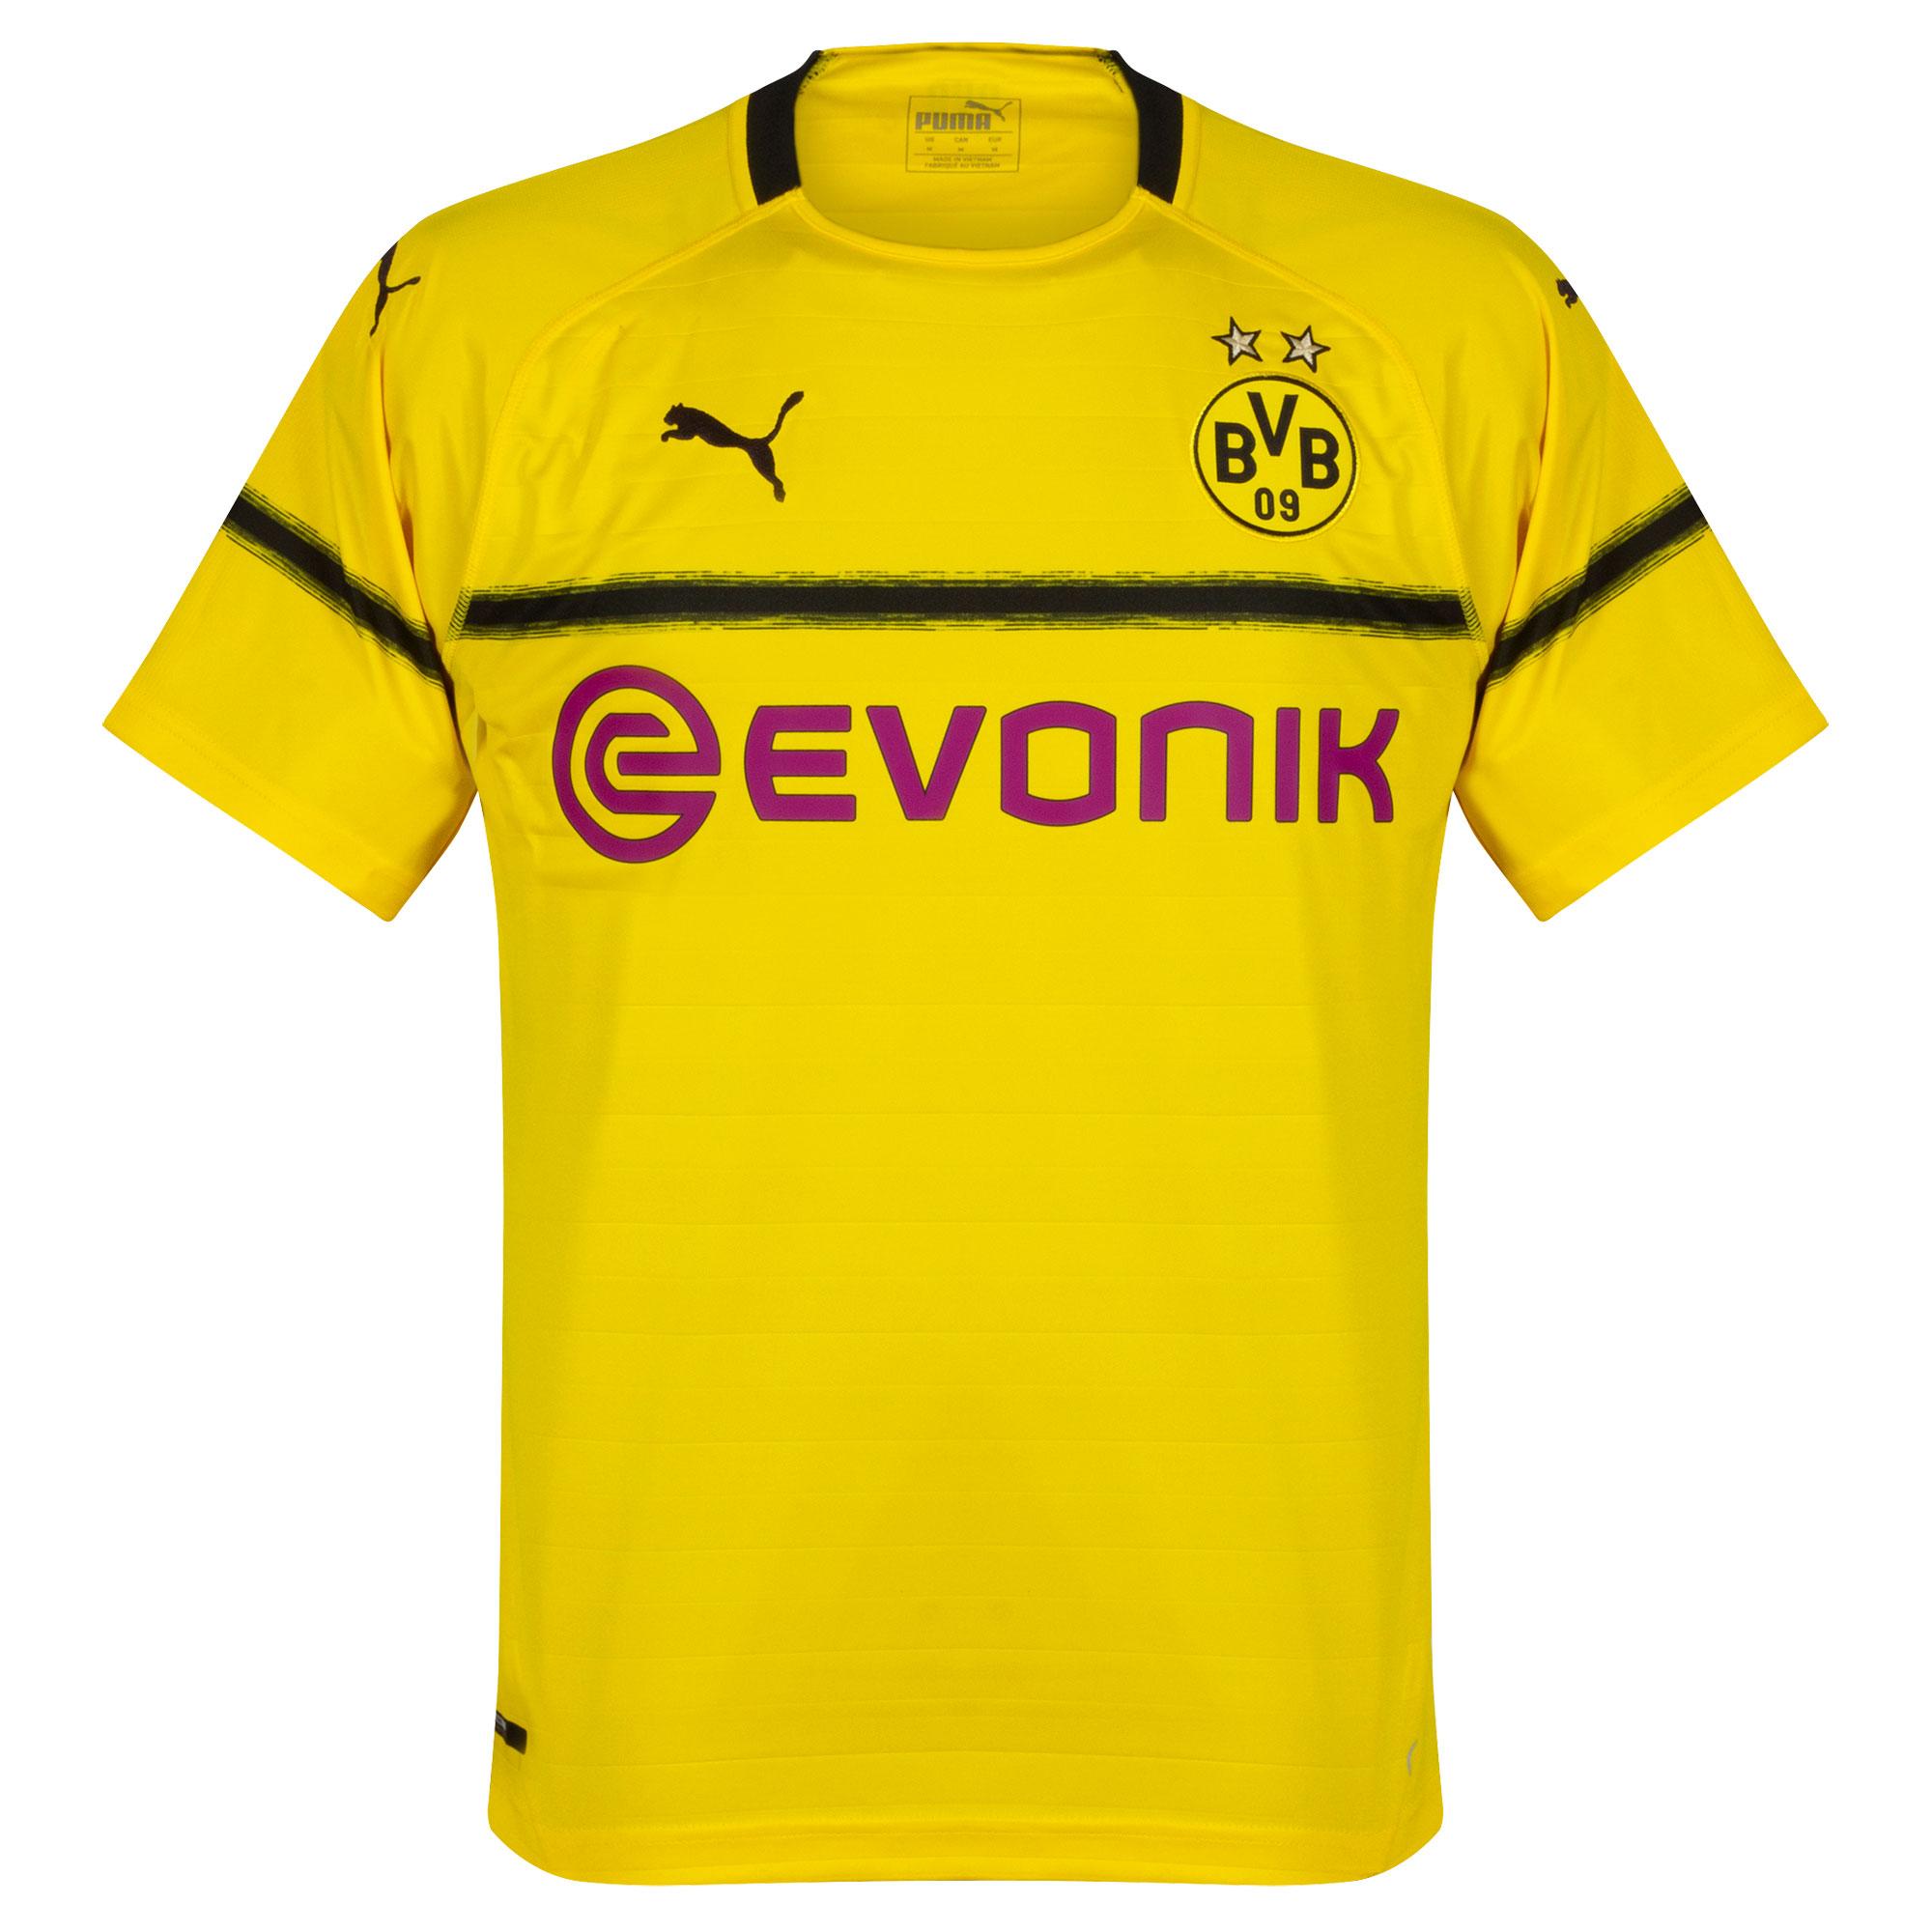 Borussia Dortmund Other shirt